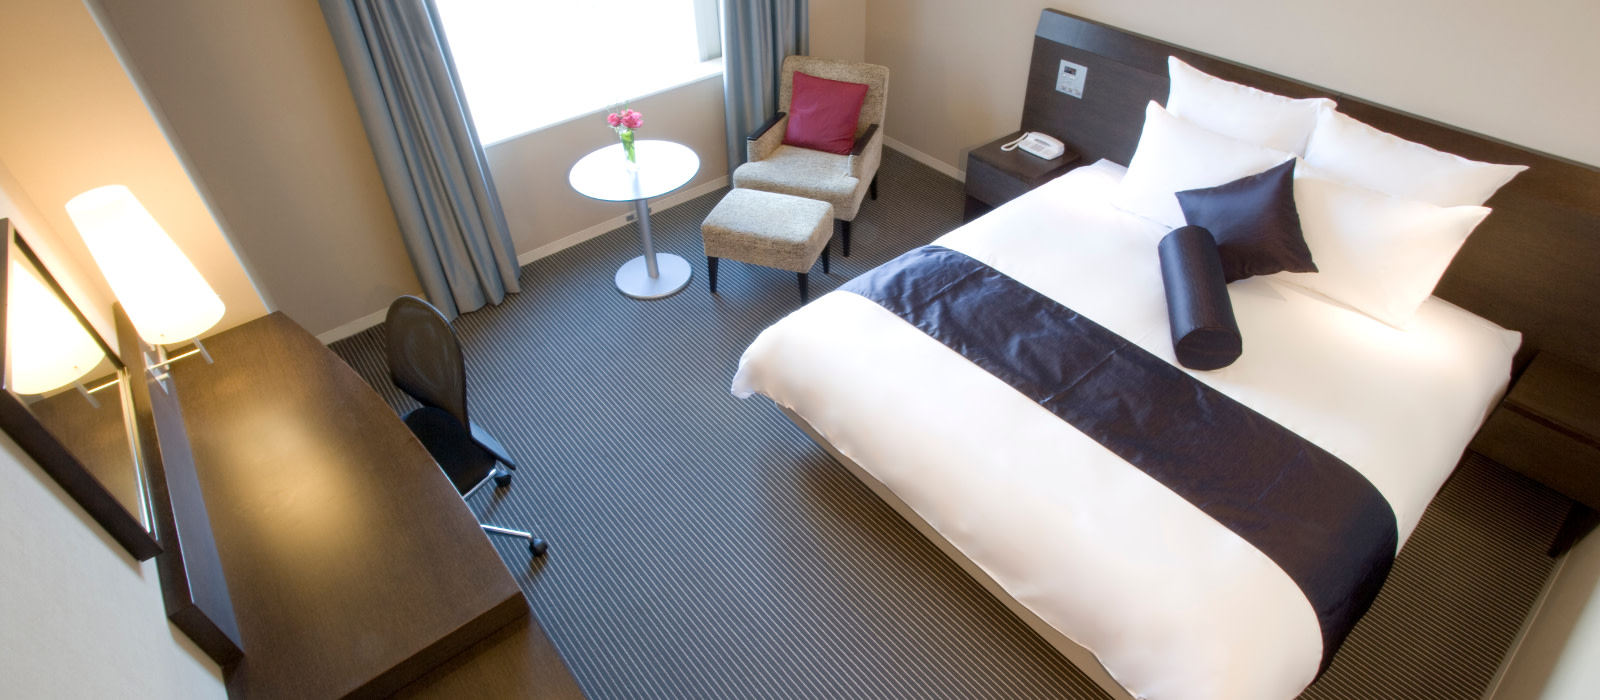 Hotel ANA Crowne Plaza Hiroshima Japan